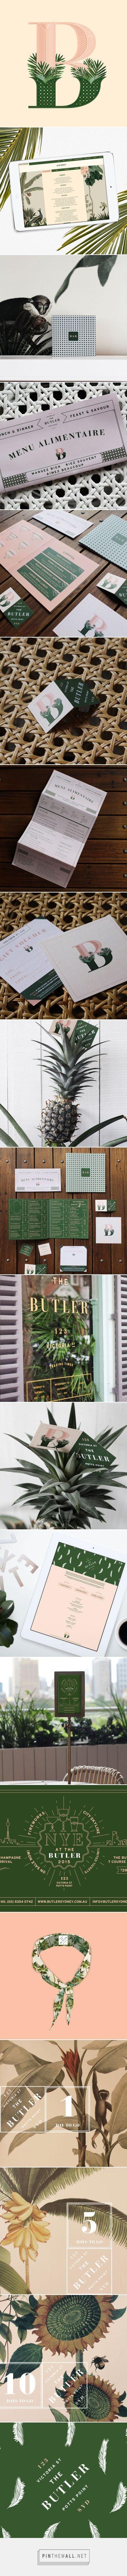 The Butler Potts Point Restaurant Branding and Menu Design by Julia Jacque | Fivestar Branding Agency – Design and Branding Agency & Inspiration Gallery